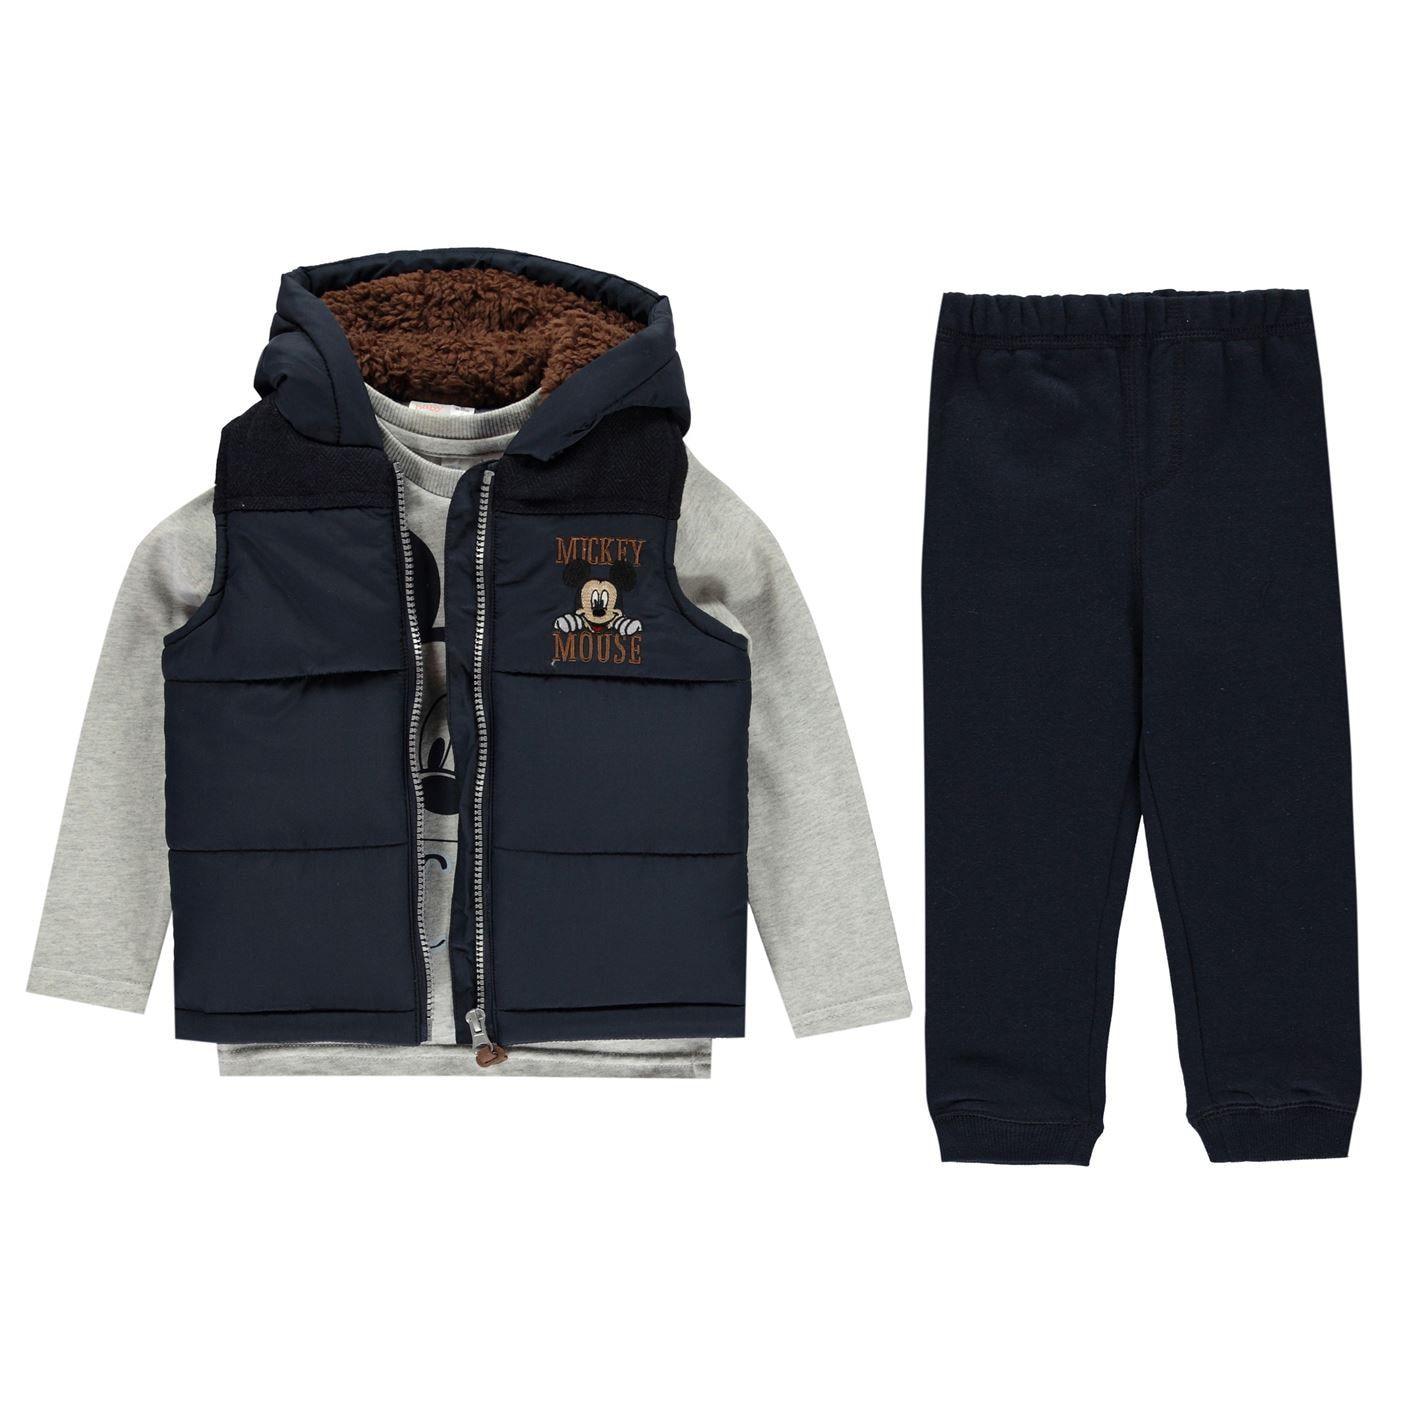 Disney Kids Gilet Set Unisex Babies Light Quilt Sleeveless Jacket Long Sleeve